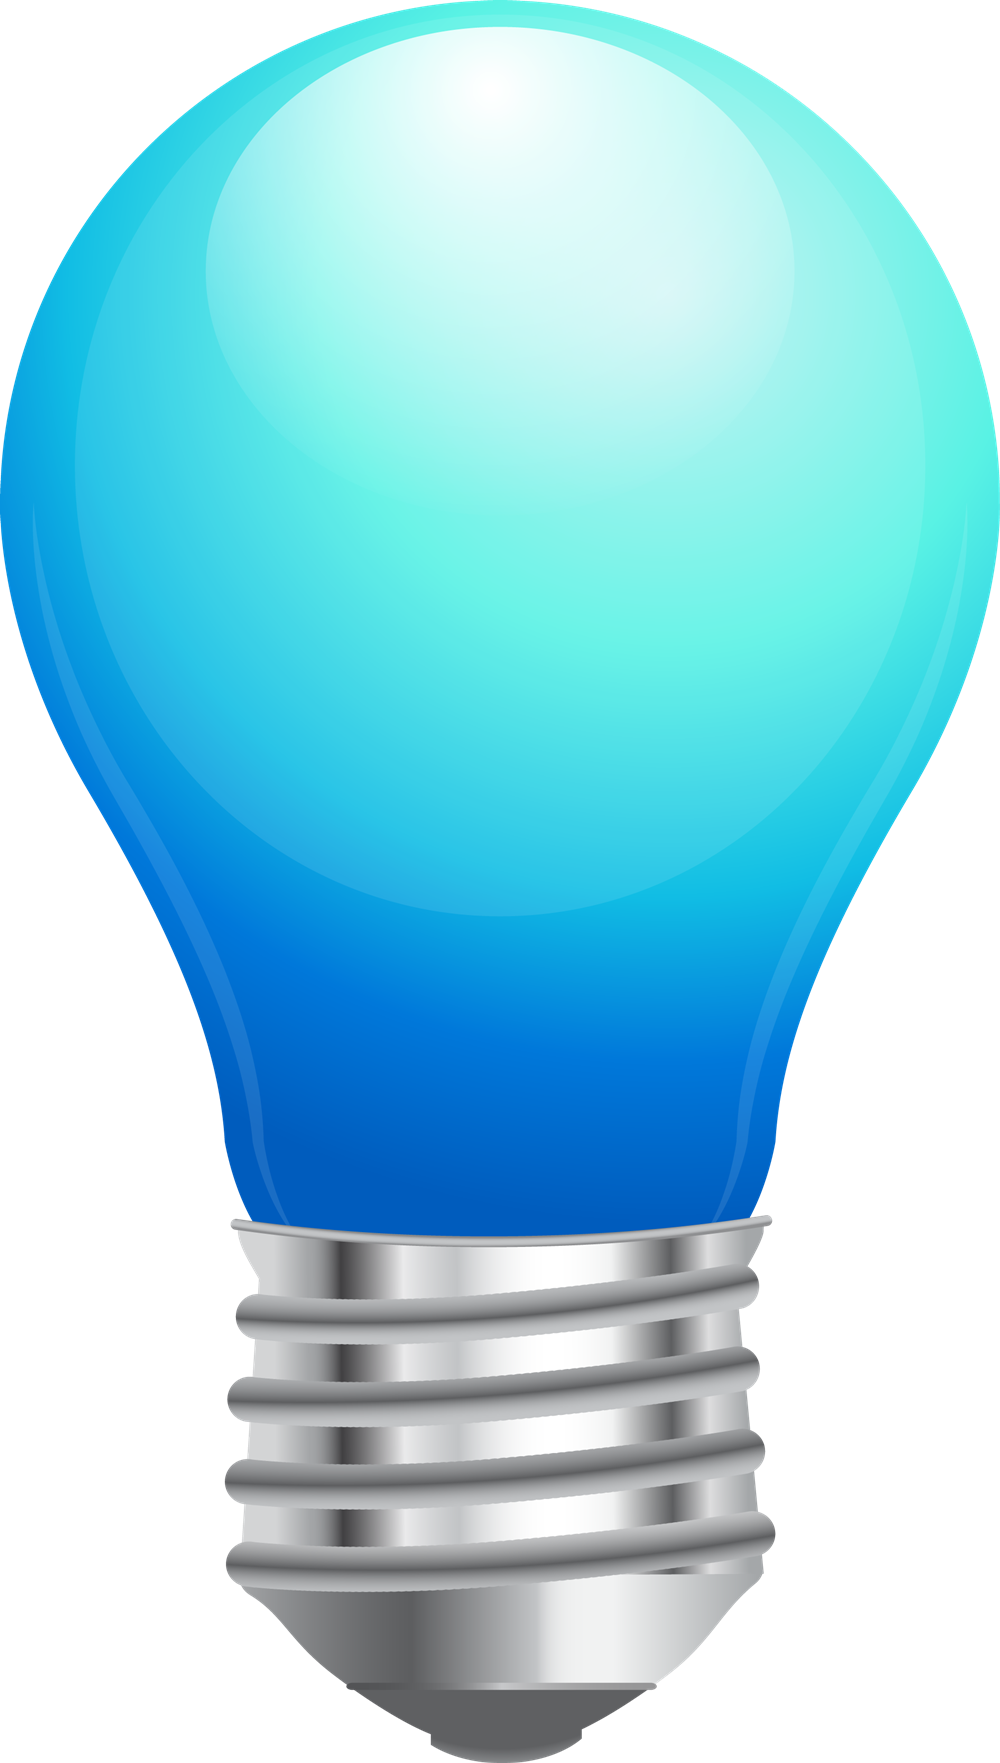 Free to Use & Public Domain Light Bulb Clip Art.